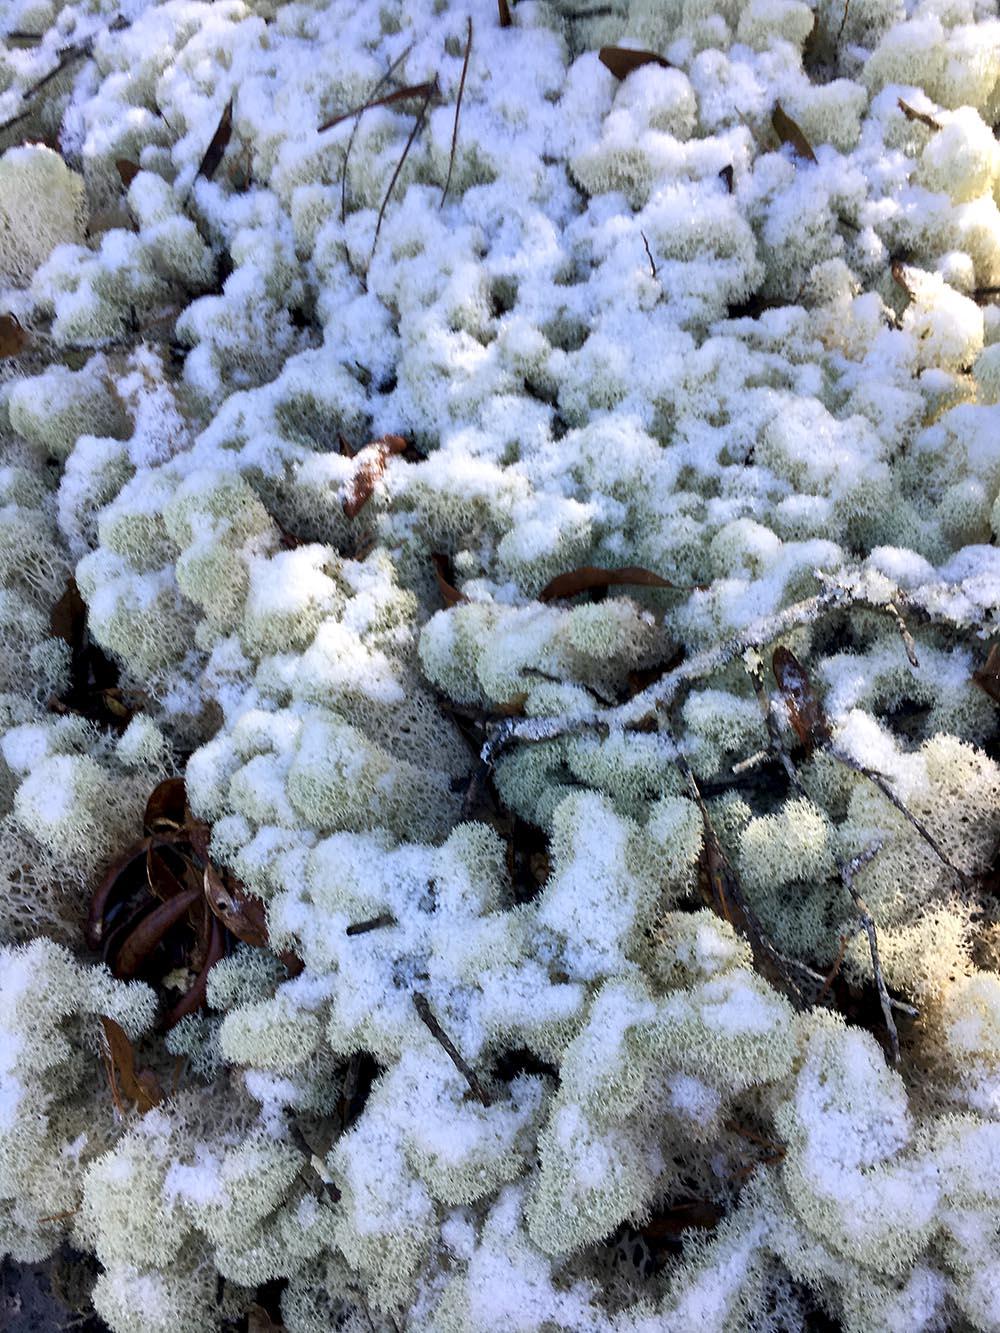 Snow covering reindeer moss.